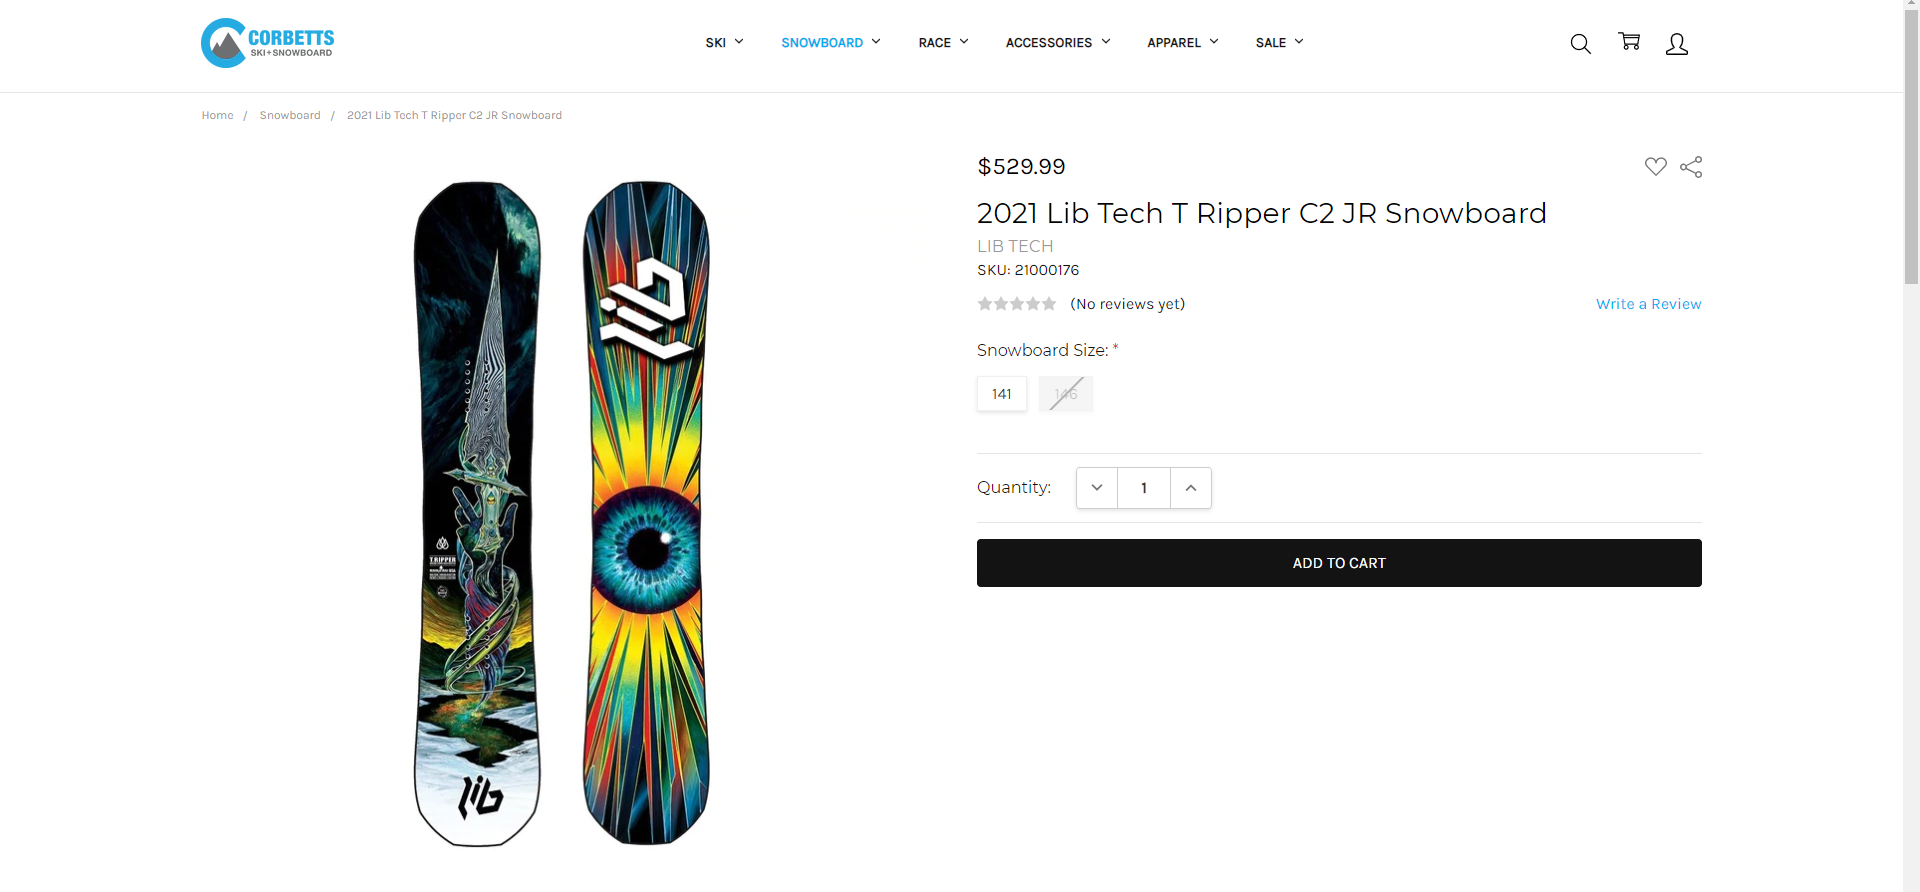 Best Snowboards 2021 - Lib Tech T Ripper